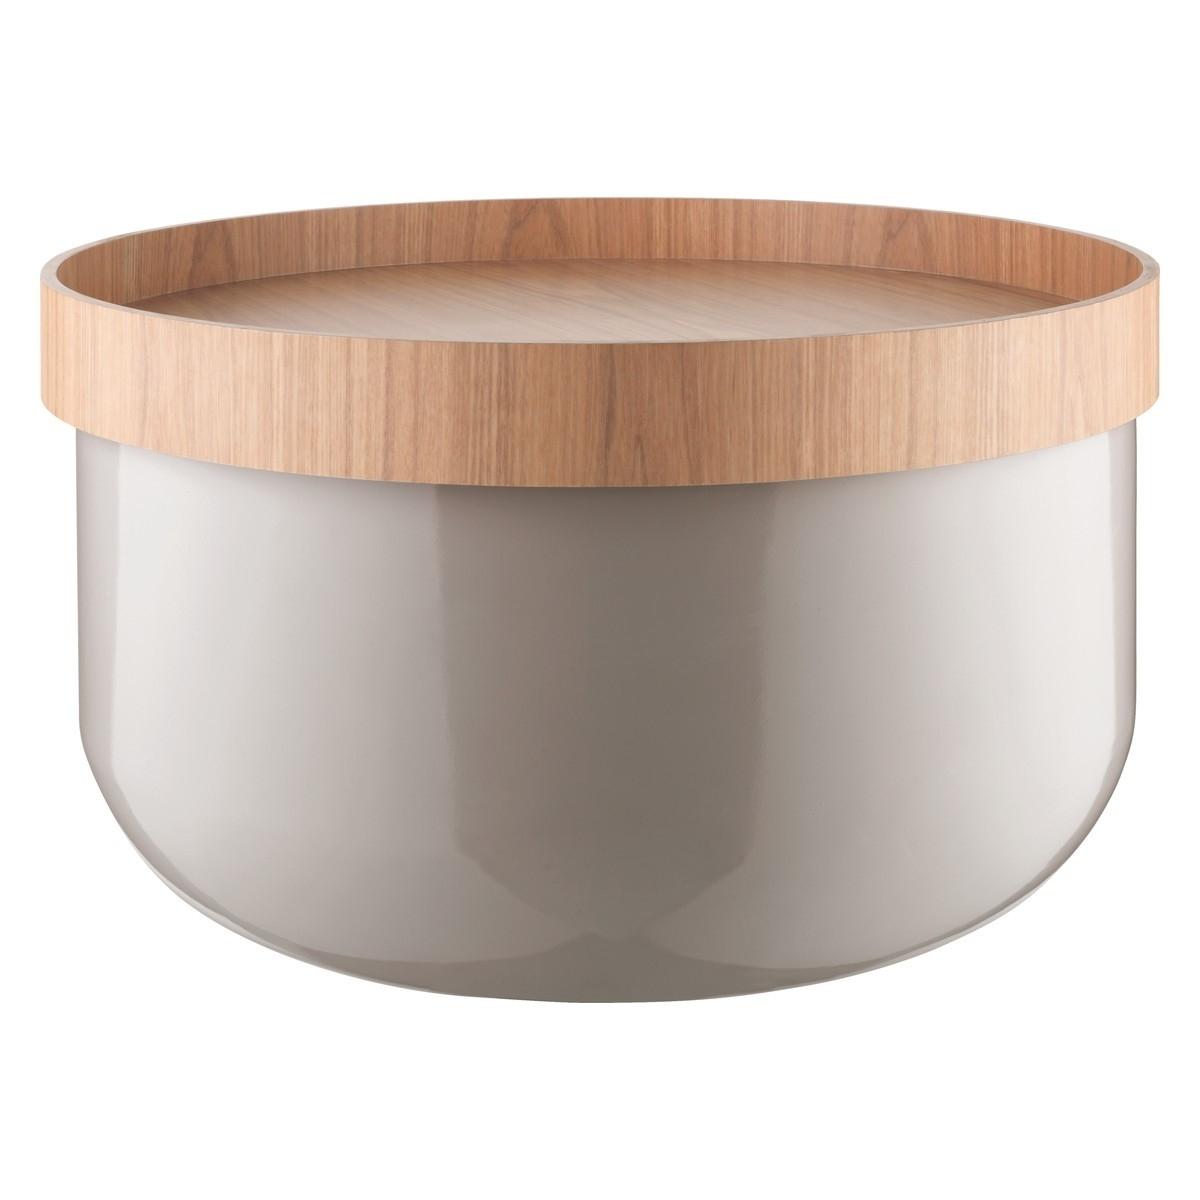 Bert Mushroom Storage Coffee Table | Buy Now At Habitat Uk With Shroom Large Coffee Tables (View 5 of 30)